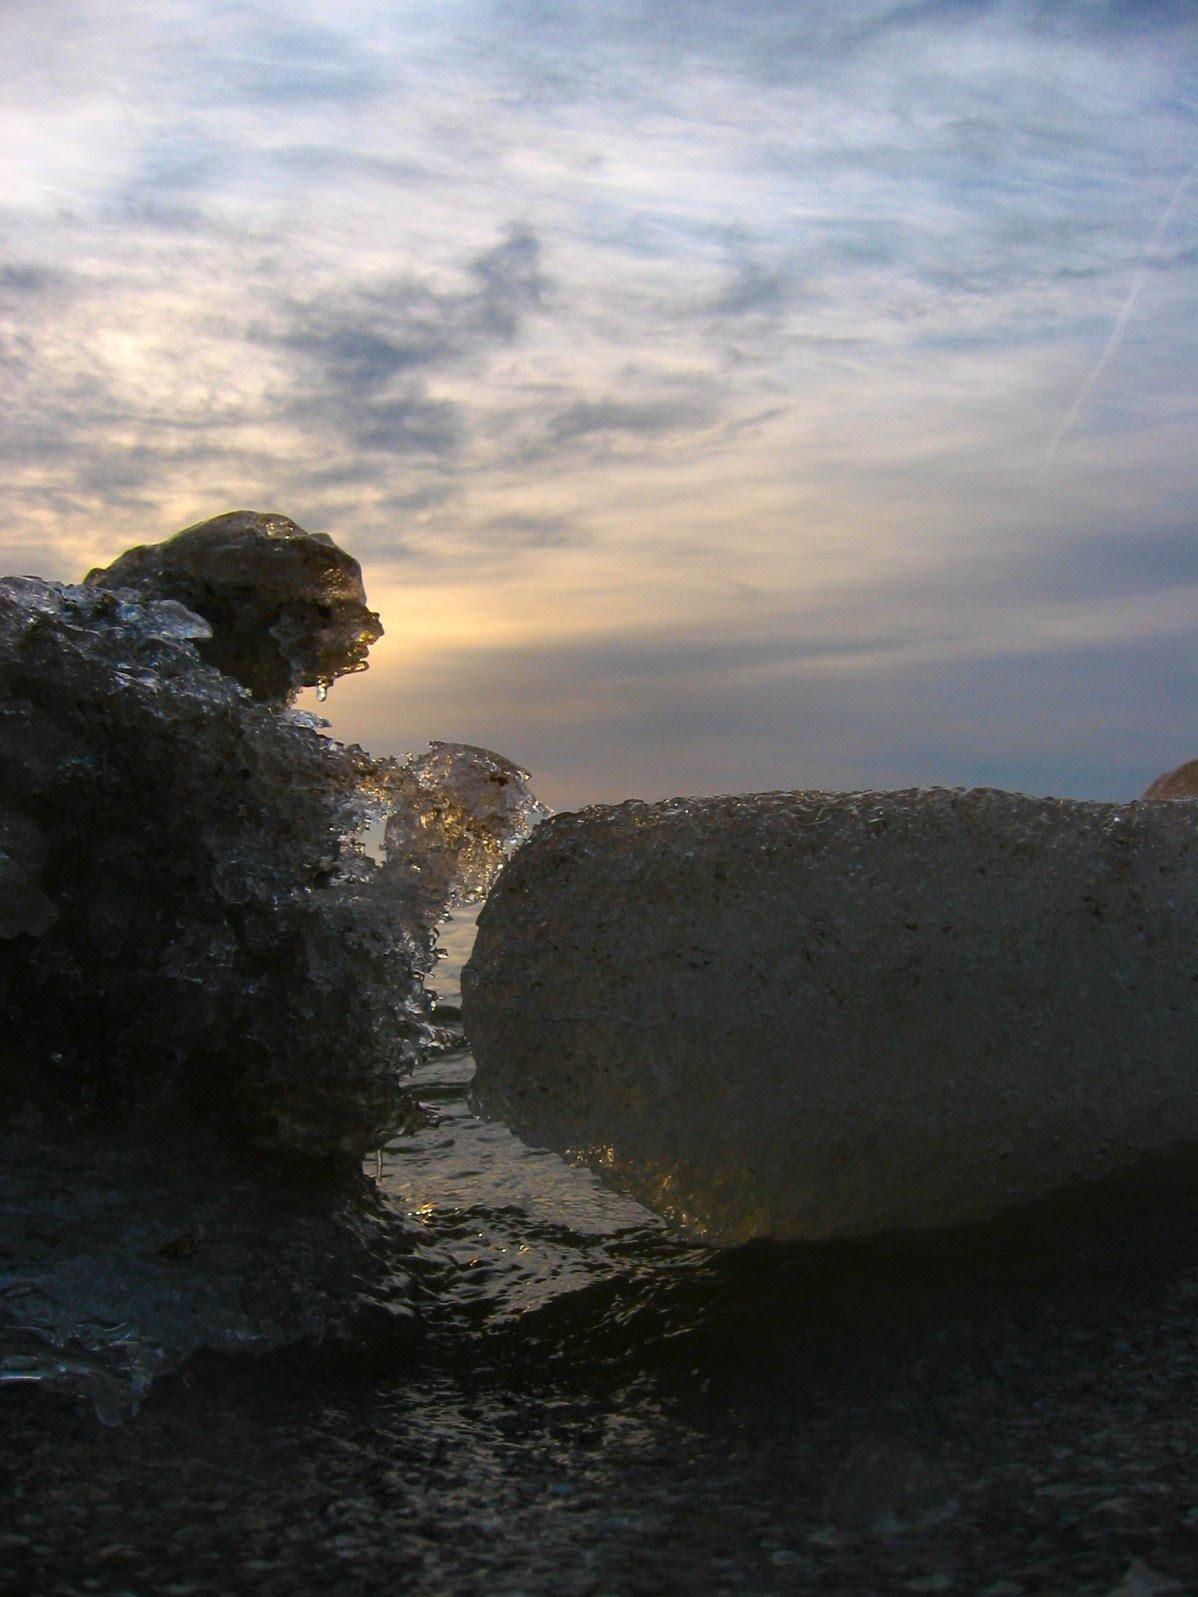 Natural Lake Michigan Ice Sculptures at Sunrise